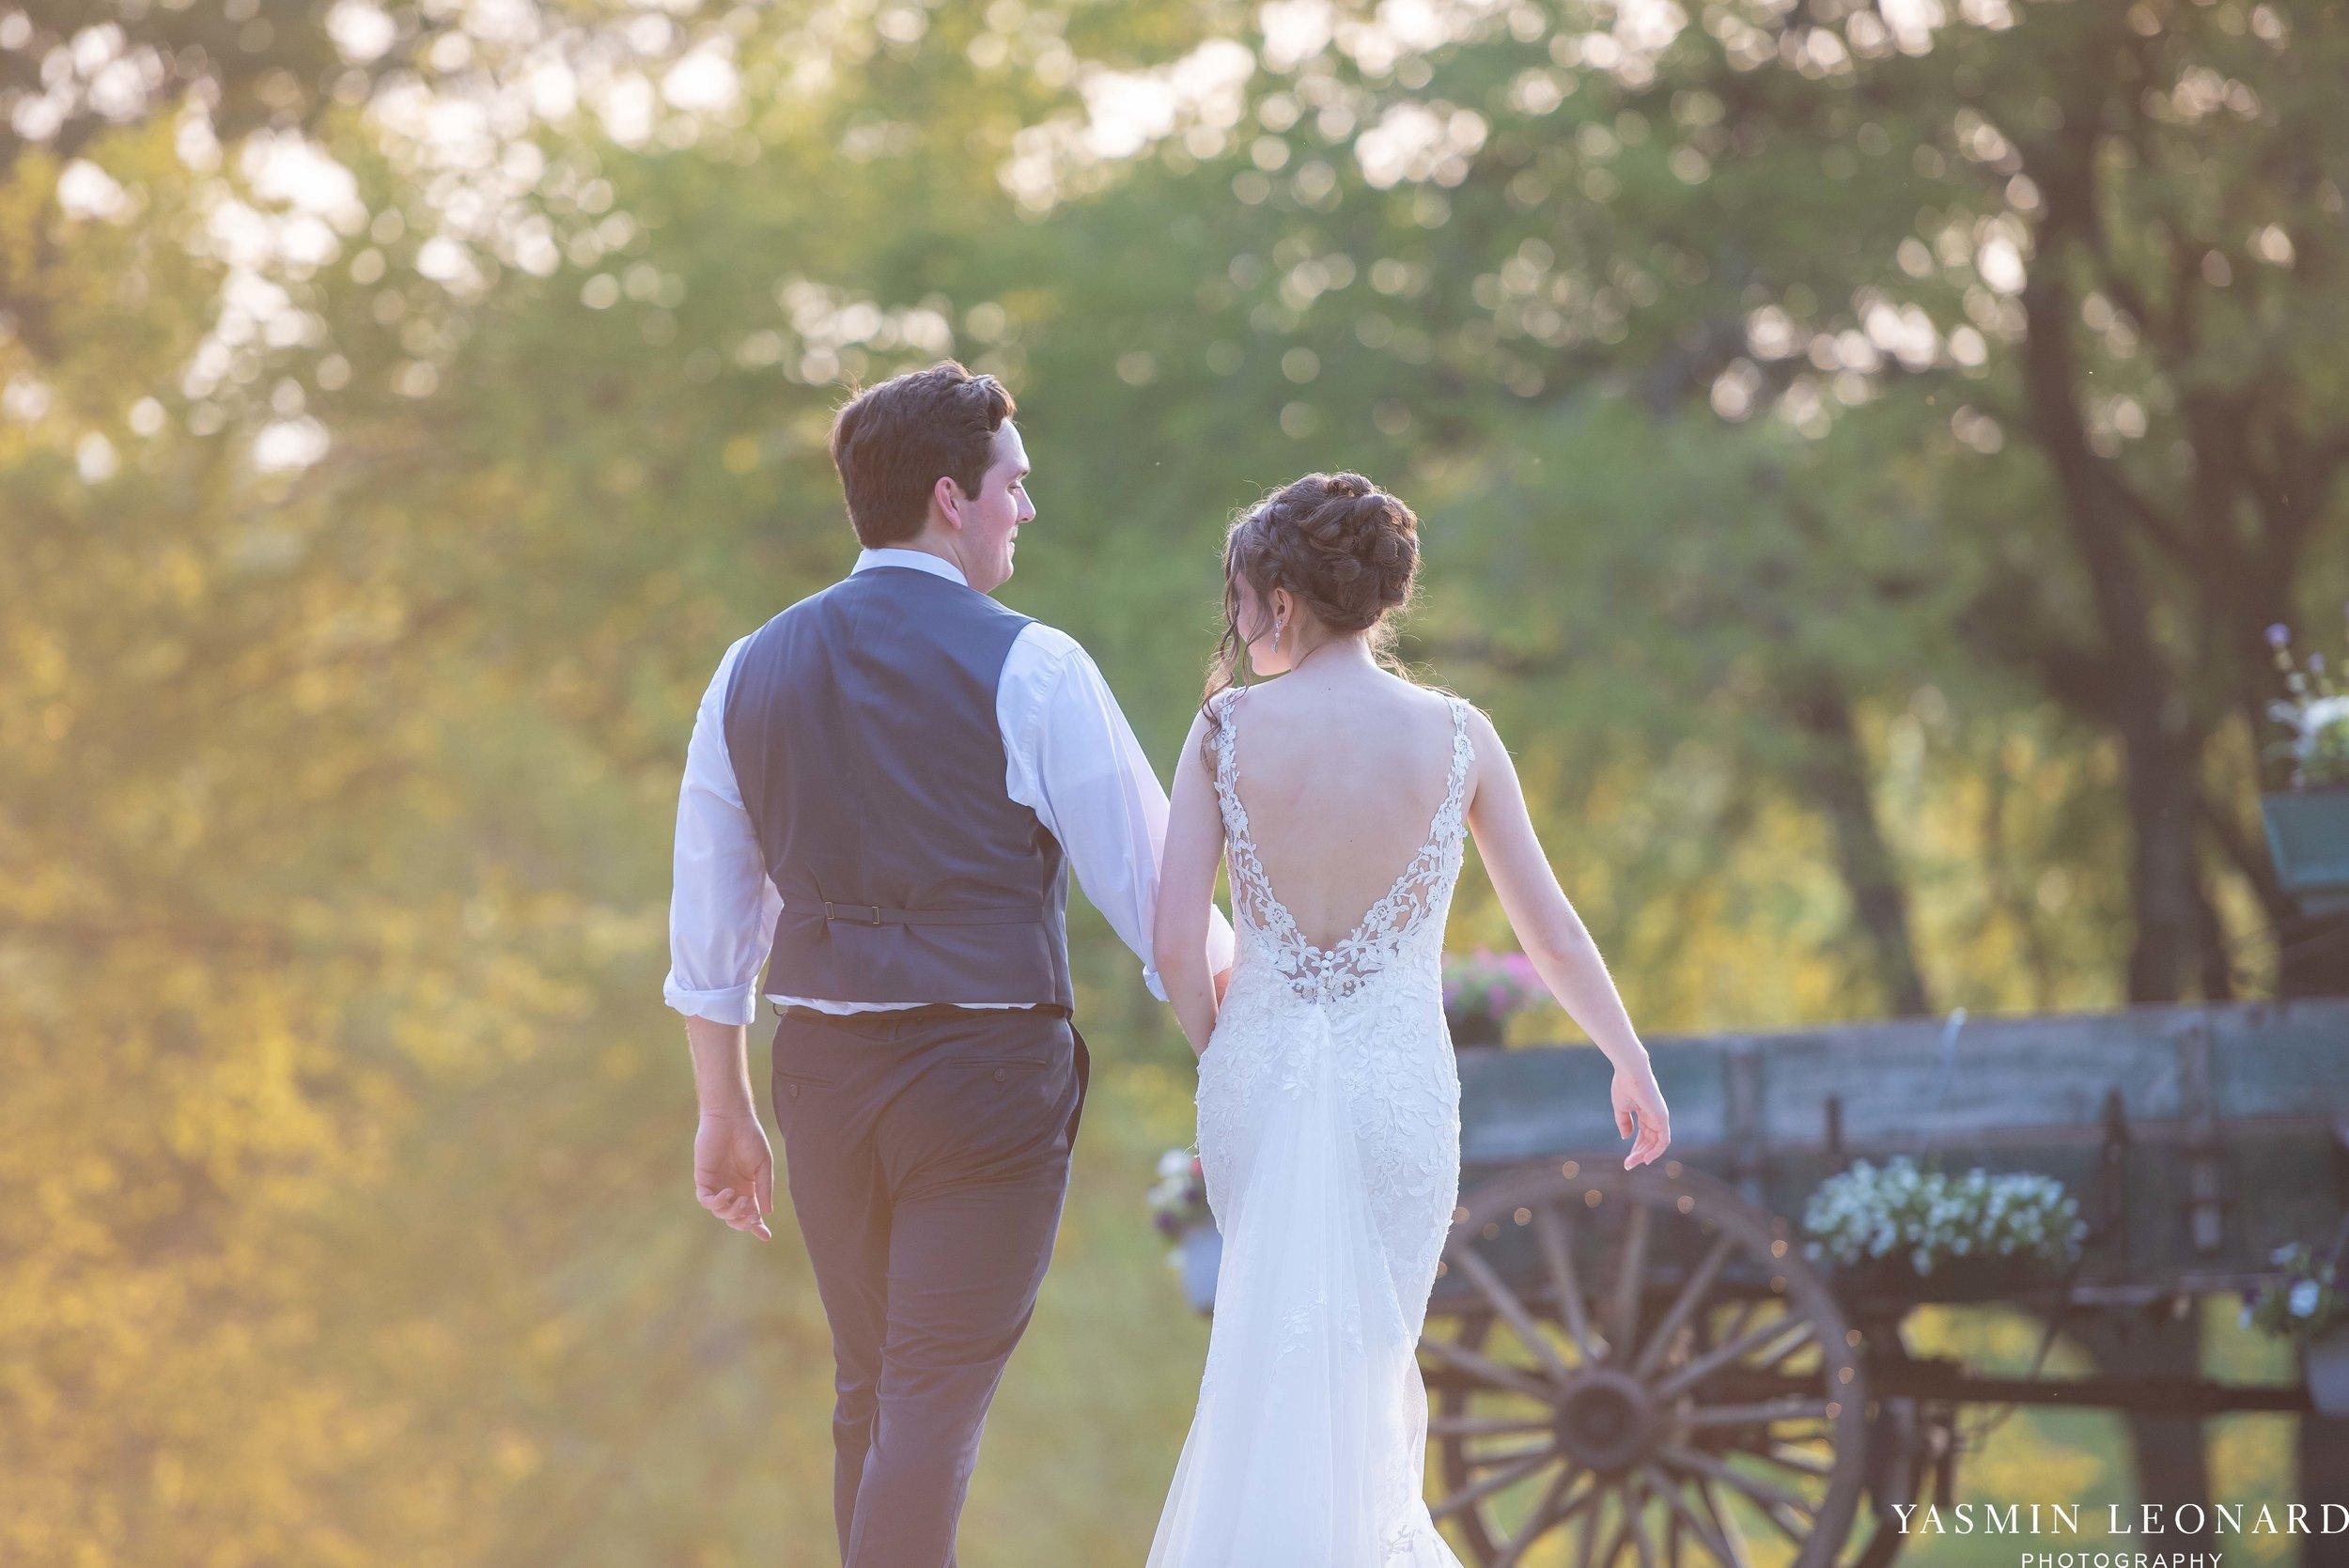 Old Homeplace Vineyard - NC Weddings - Outdoor Summer Weddings - Peony Boutique - Vineyard Wedding - NC Photographer - Yasmin Leonard Photography-61.jpg